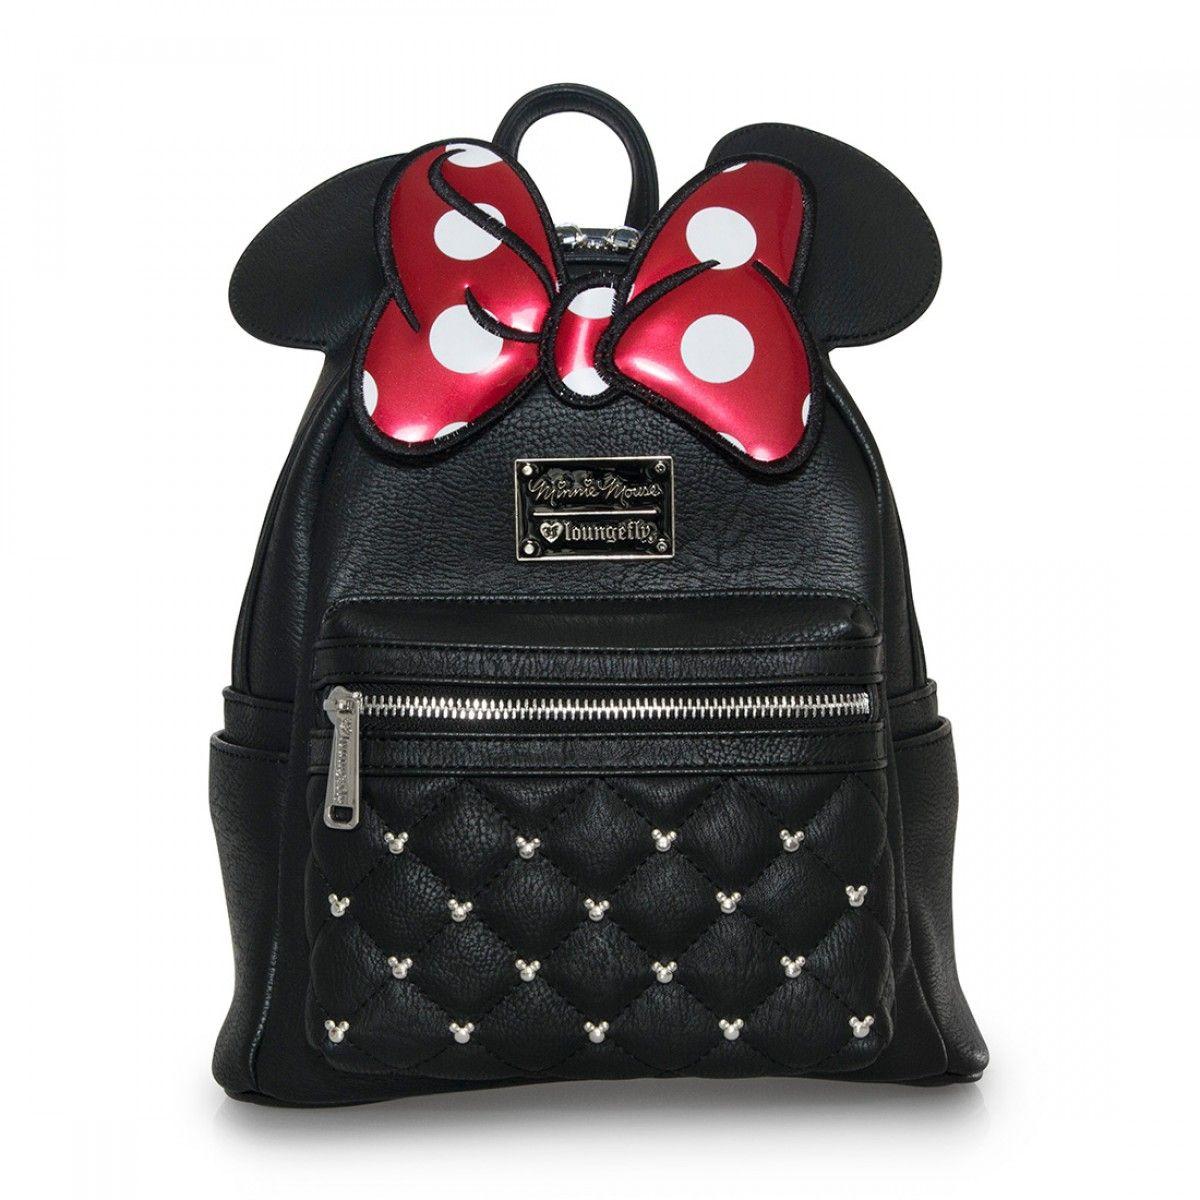 6e3cba5116 Loungefly x Minnie Bow Mini Backpack - Disney - Brands